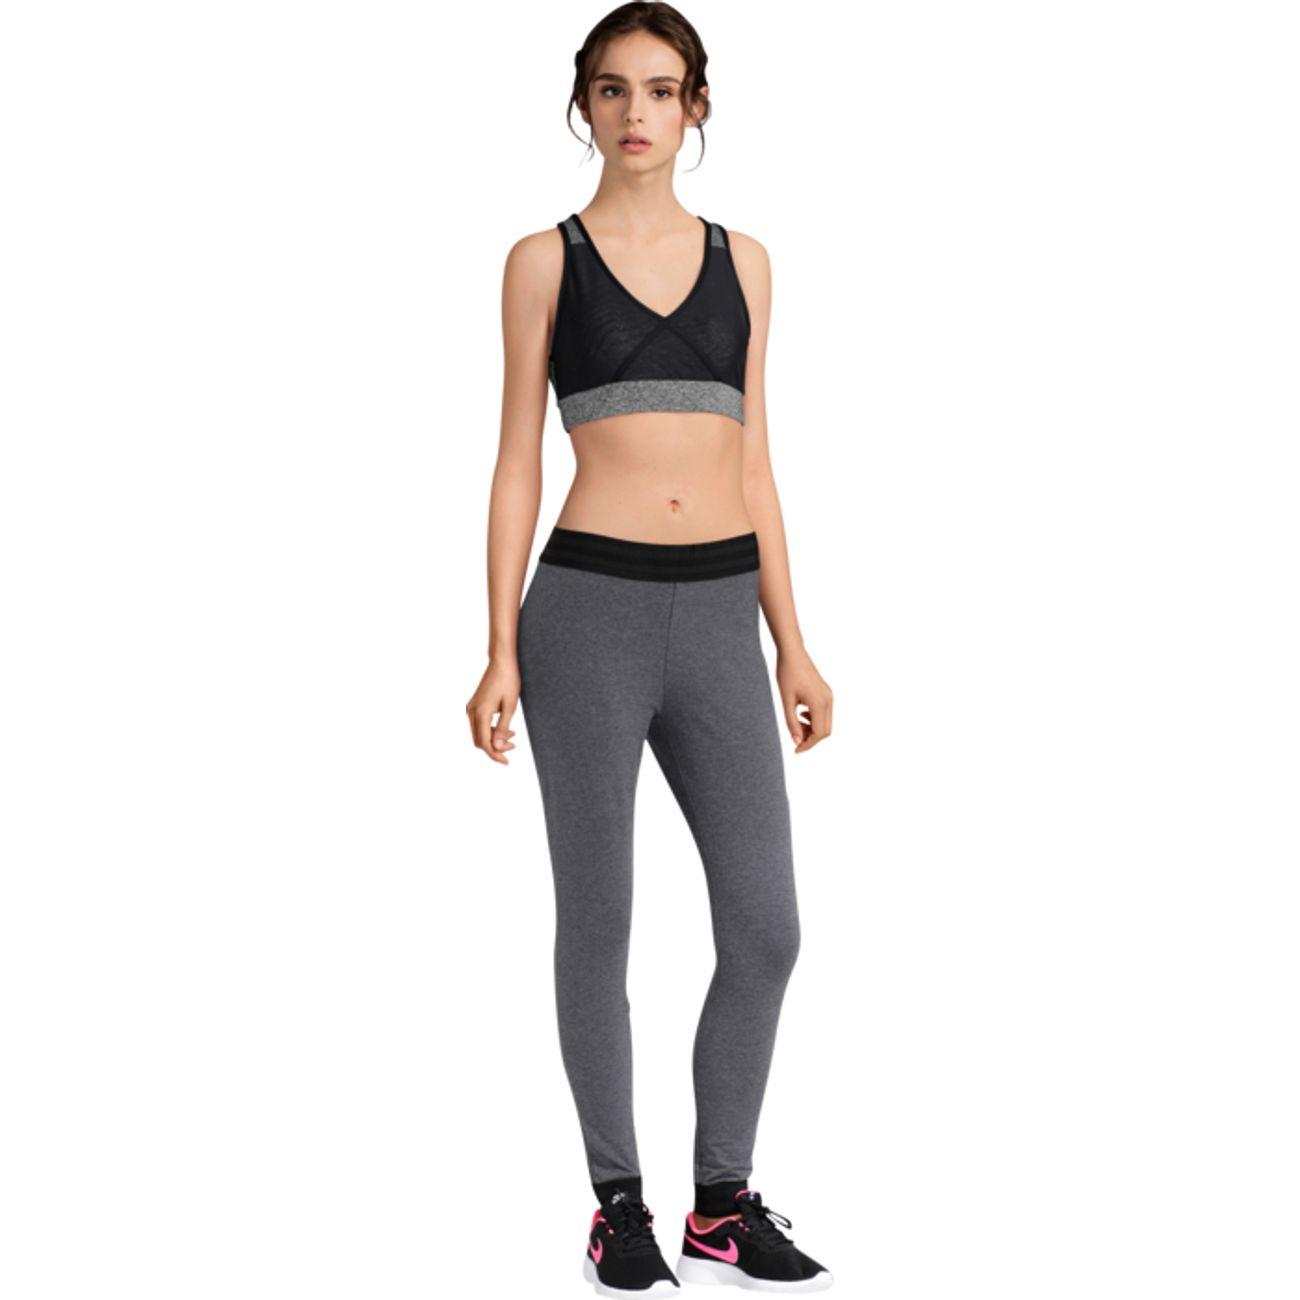 BRASSIERE Cardio Fitness femme ATHLITECH GEORGIA